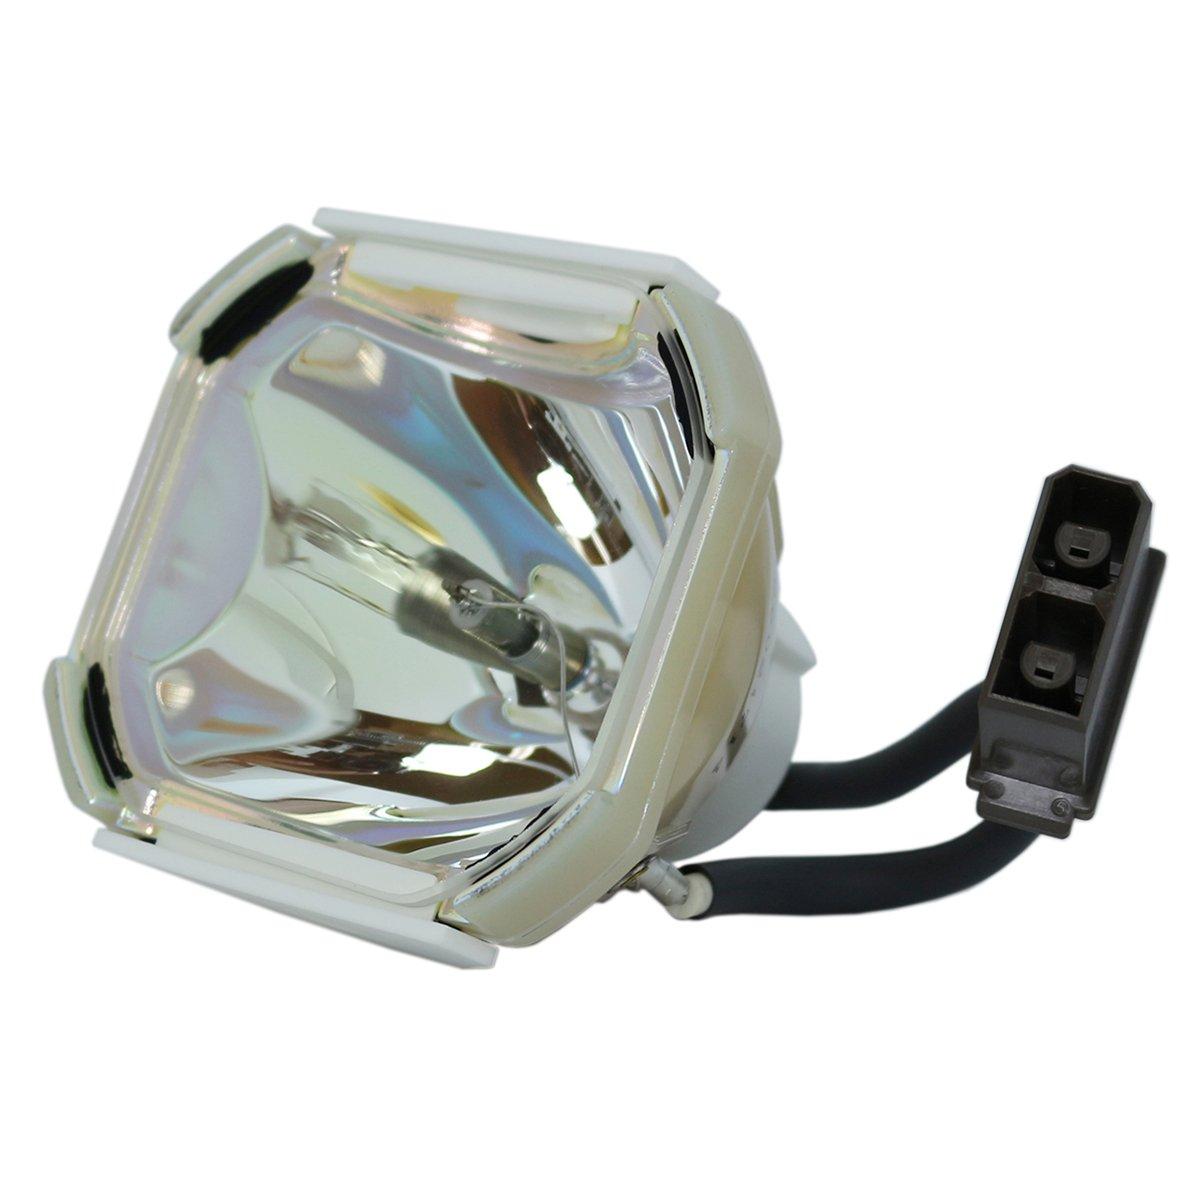 LYTIO プレミアムインフォーカス SP-LAMP-LP770 プロジェクターランプ SP LAMP LP770 (オリジナルOEM電球)   B07JJ2GRVH